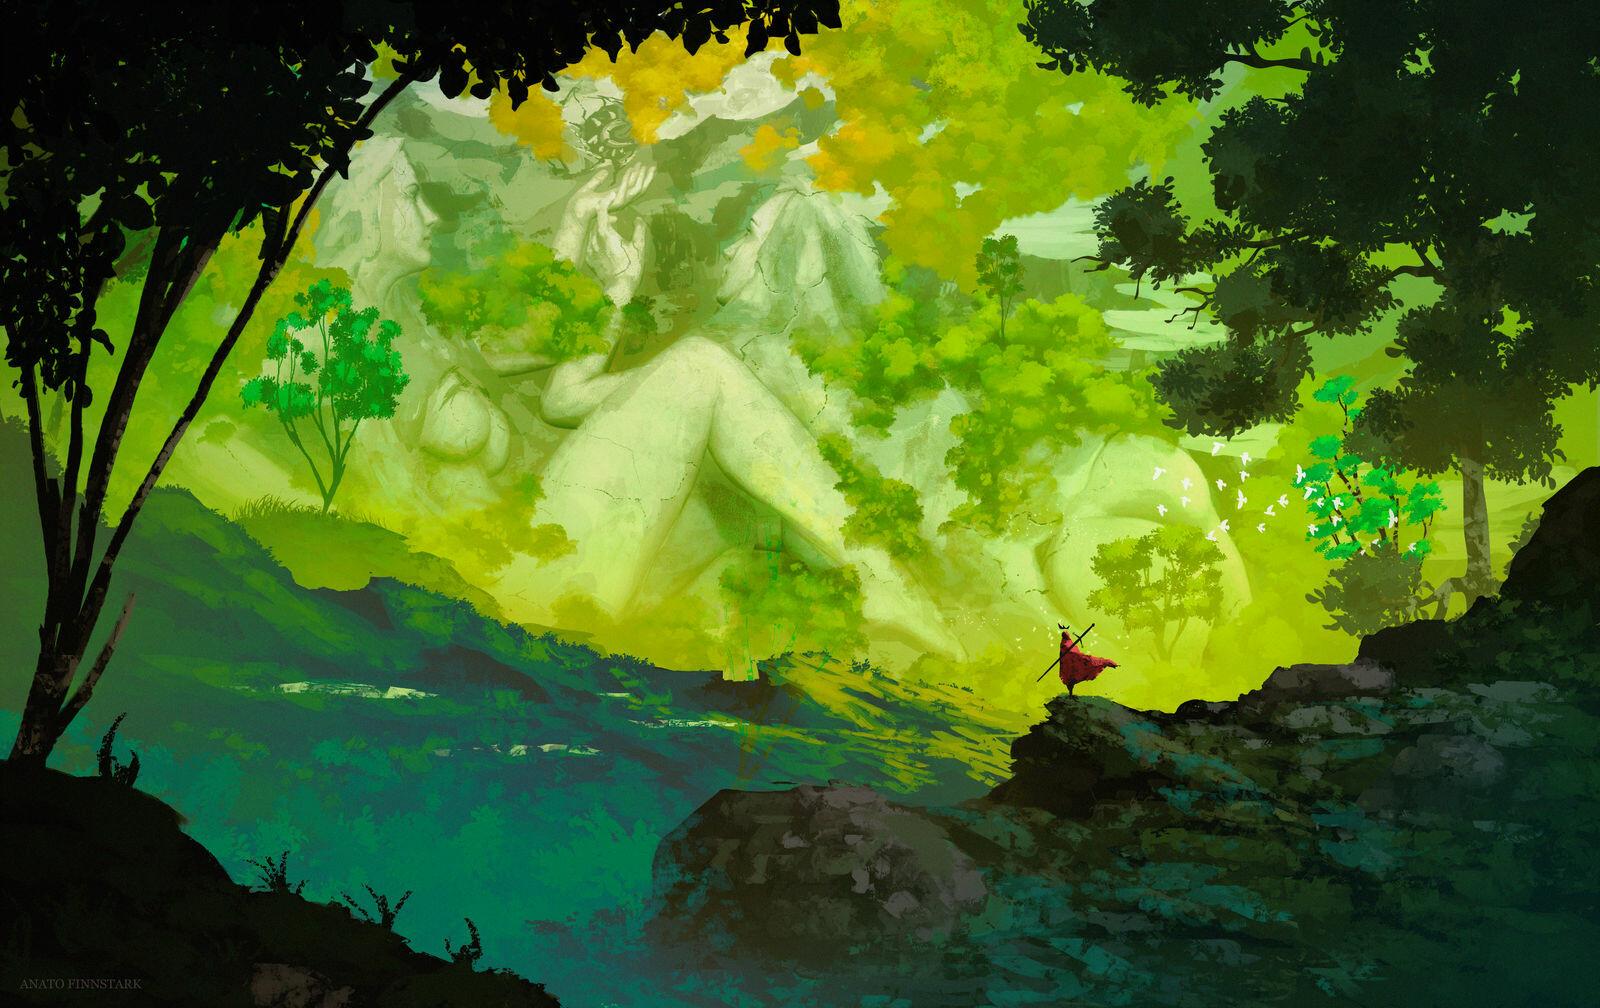 Anato finnstark the king s journey the divide by anatofinnstark dd56mil fullview